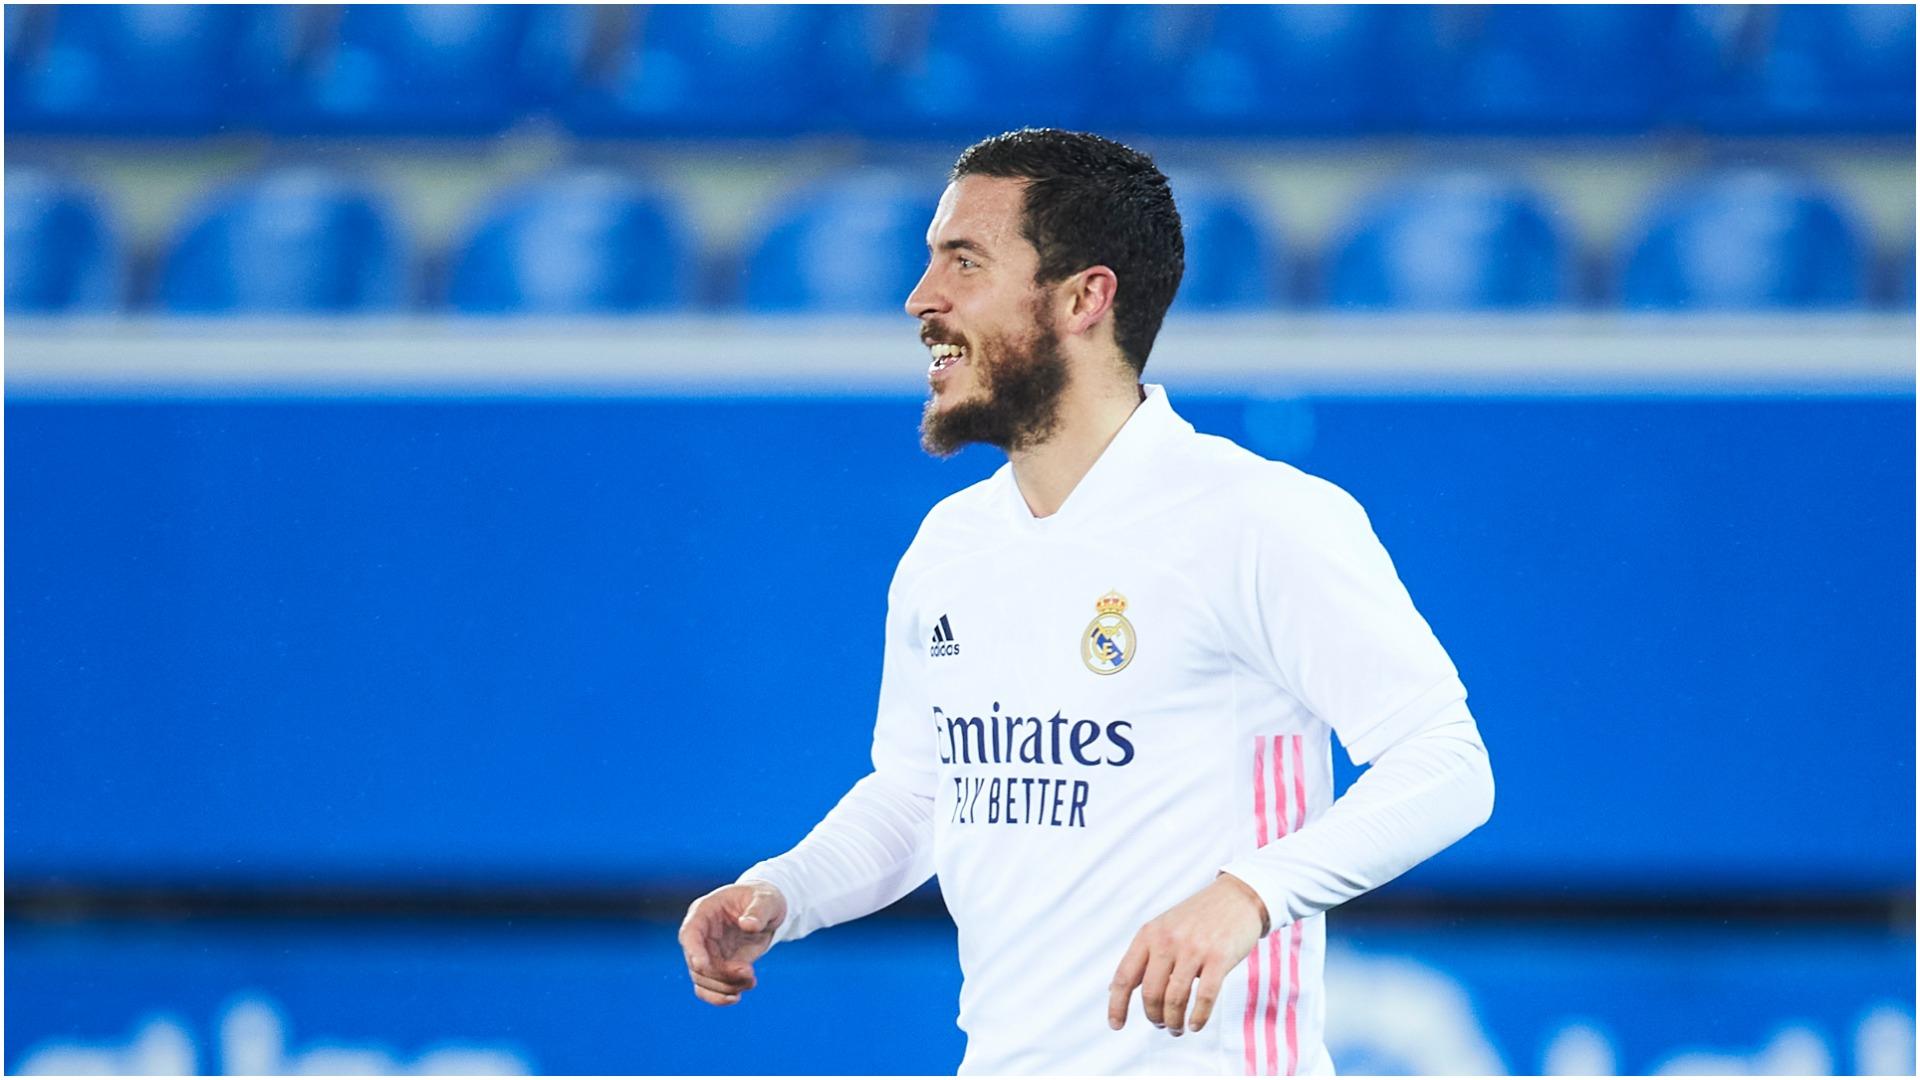 Real Madrid need the best Hazard - Benzema